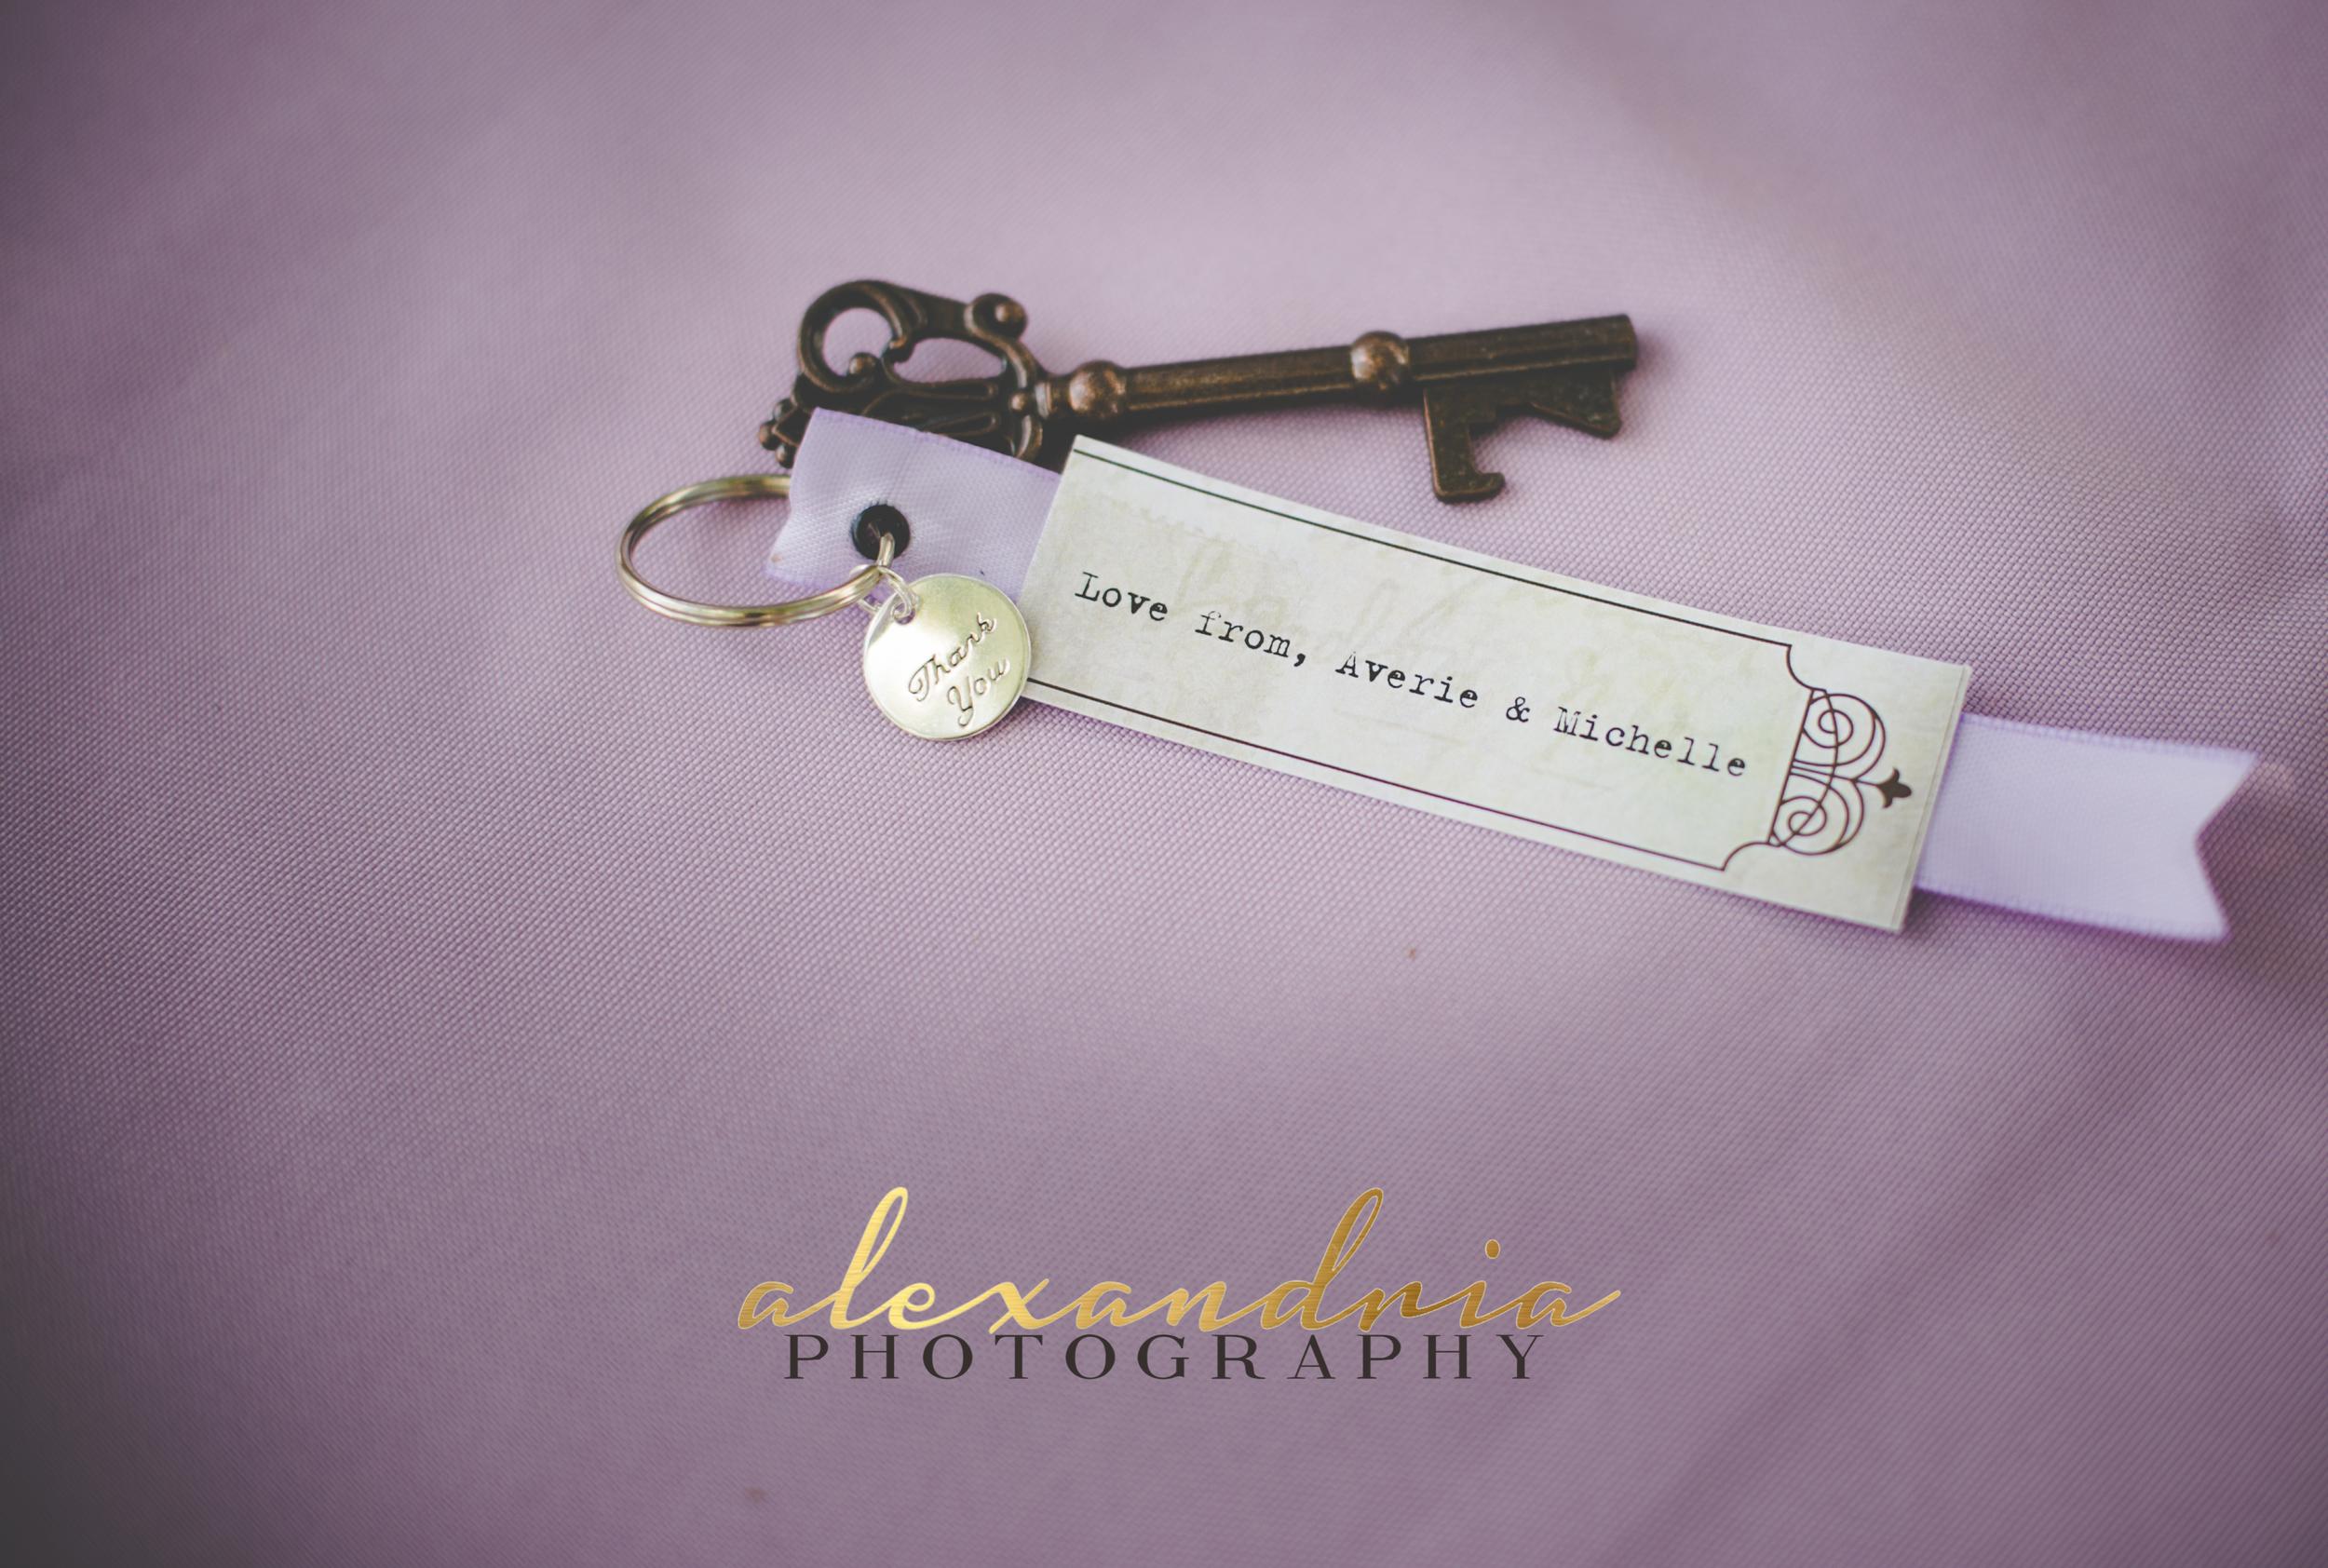 WMAlexandria Photography AM 5872.jpg